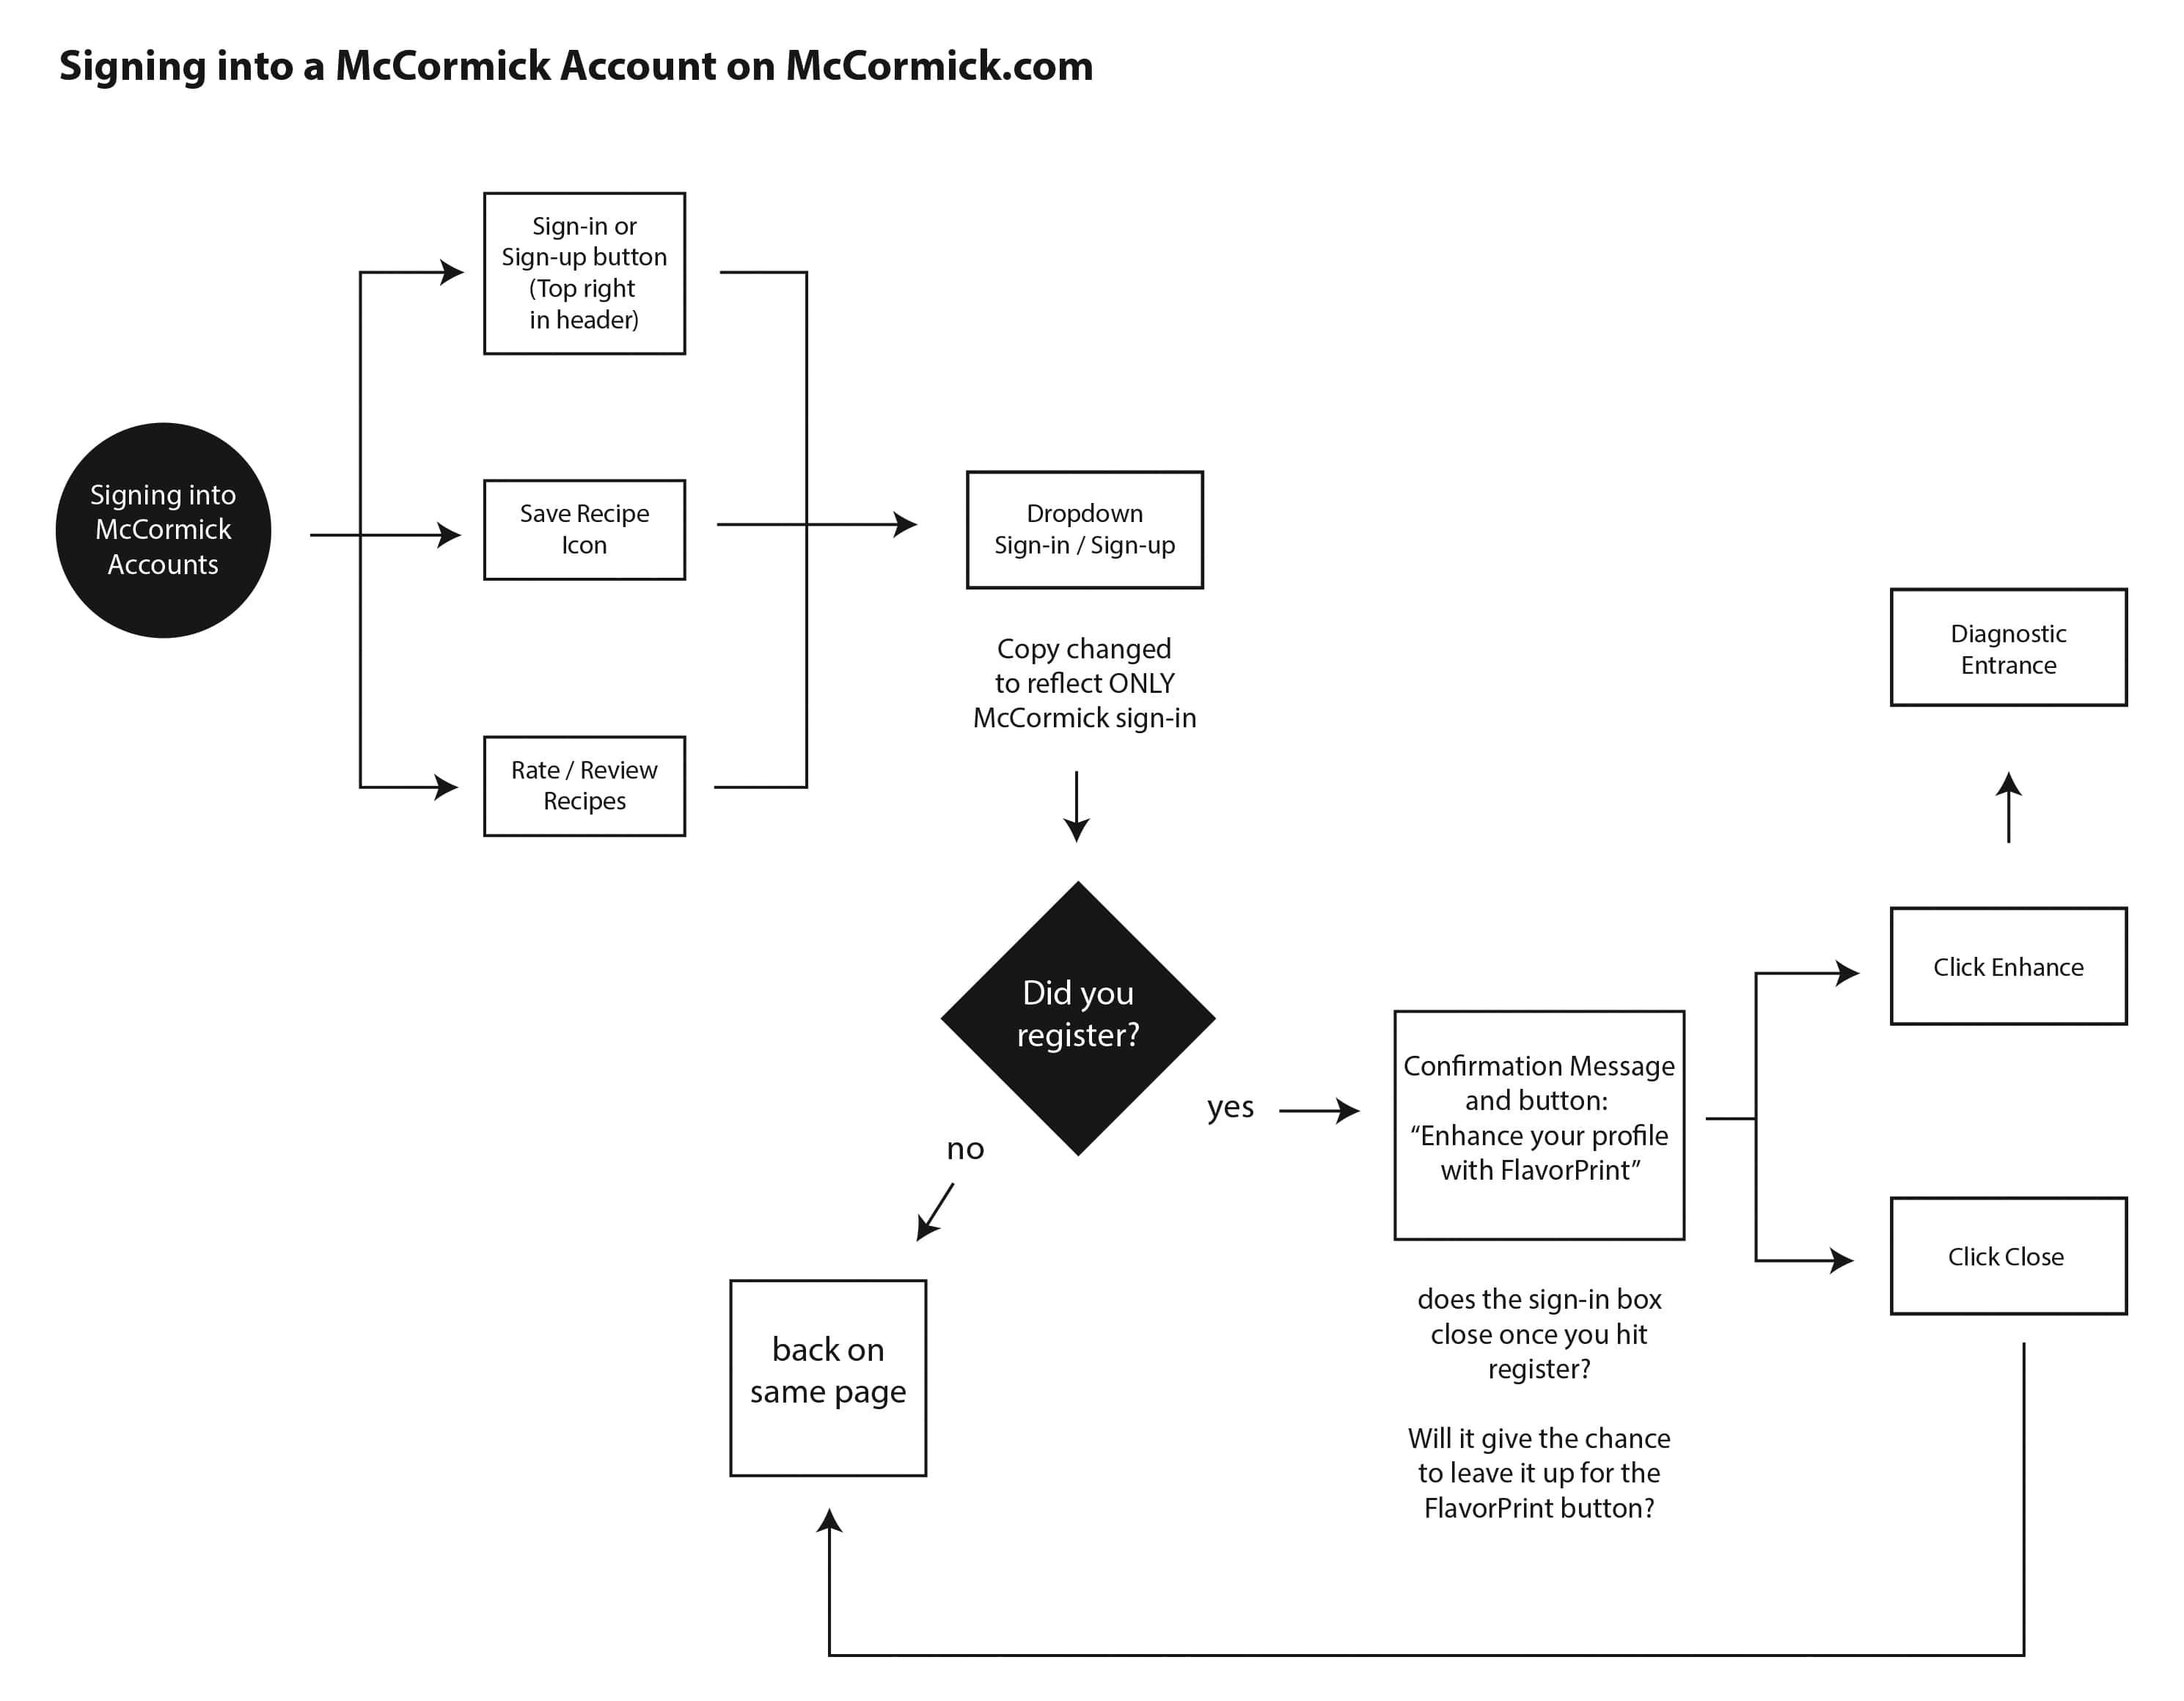 McCormick login for FlavorPrint